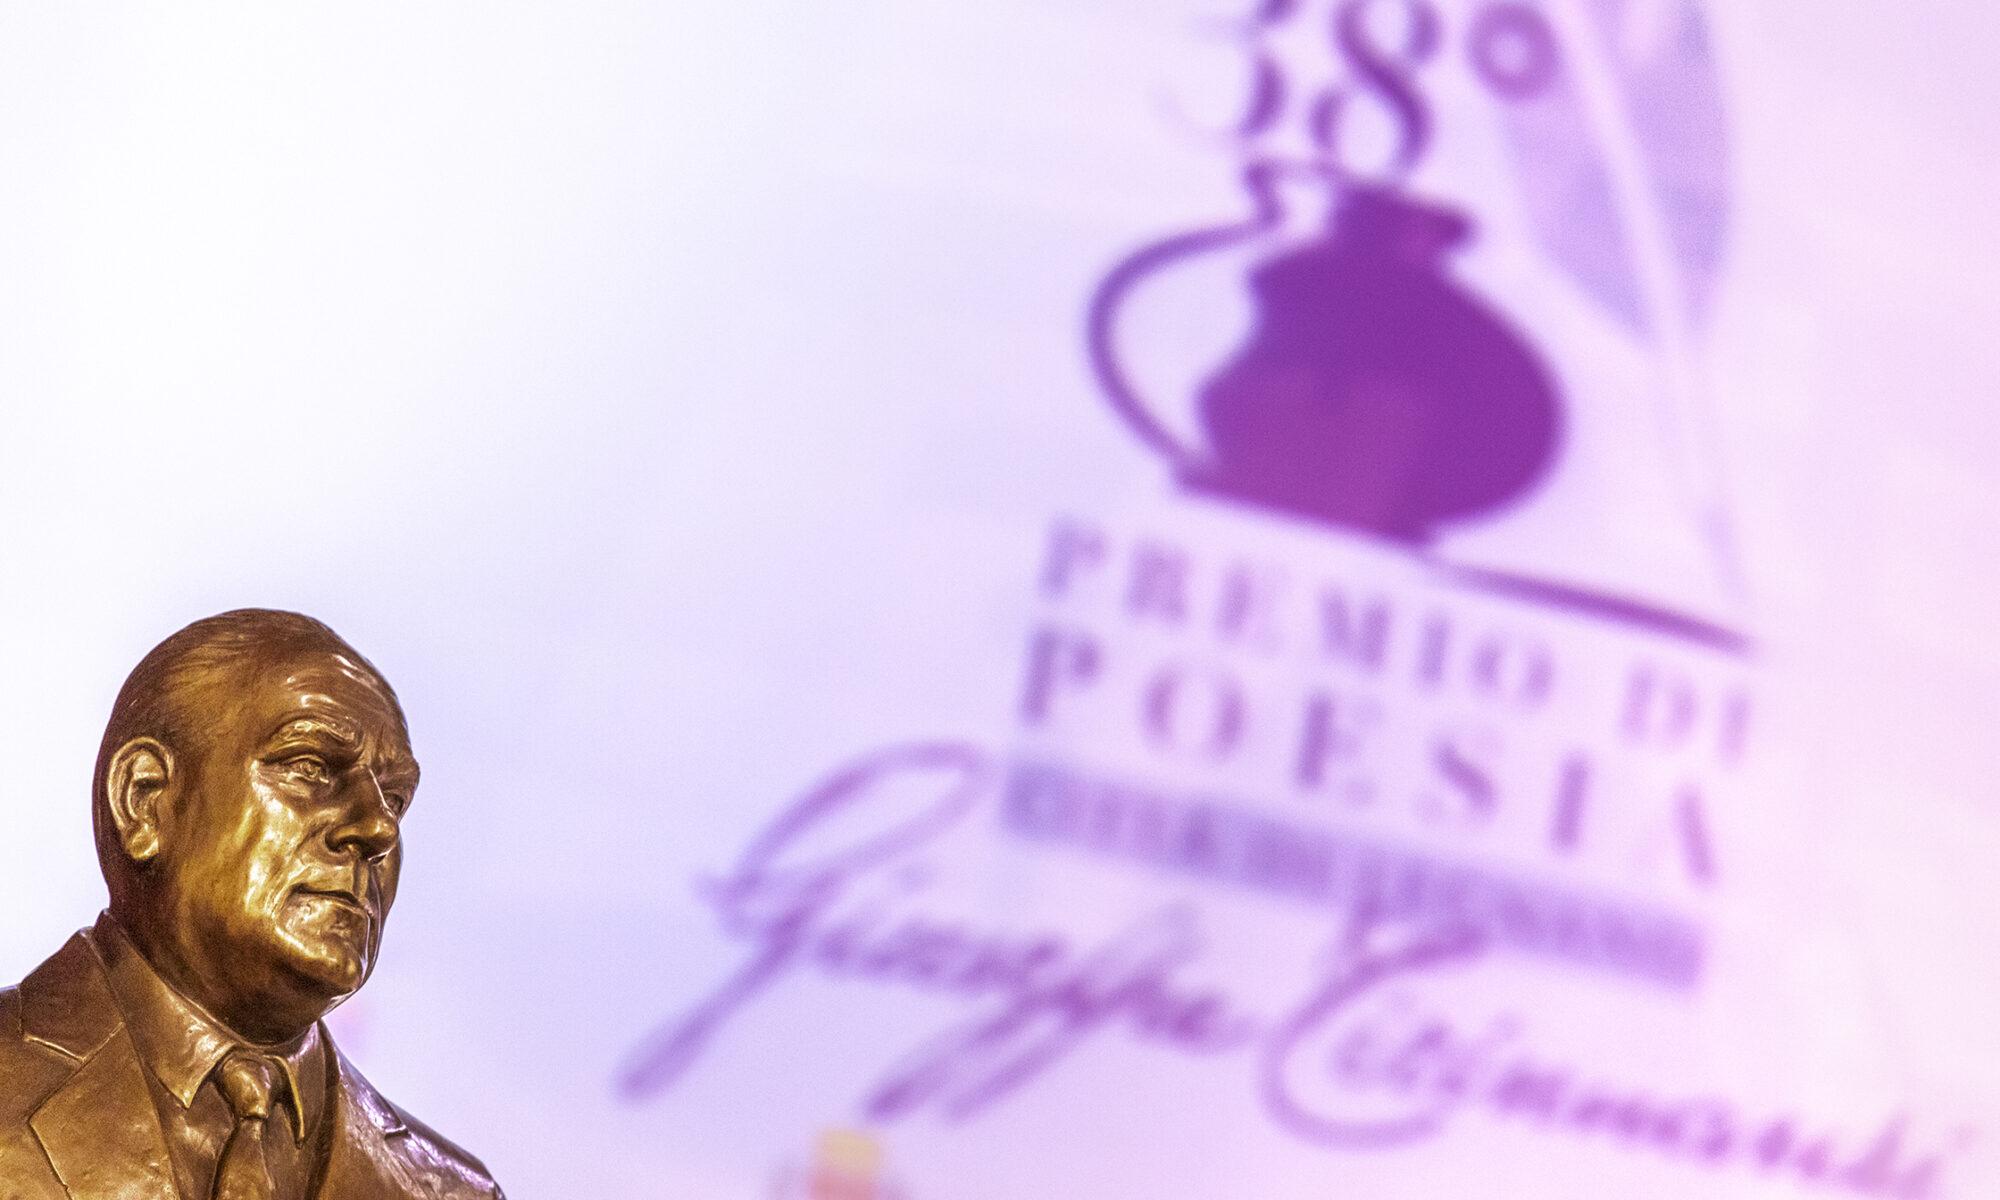 Premio di Poesia Città di Legnano – Giuseppe Tirinnanzi